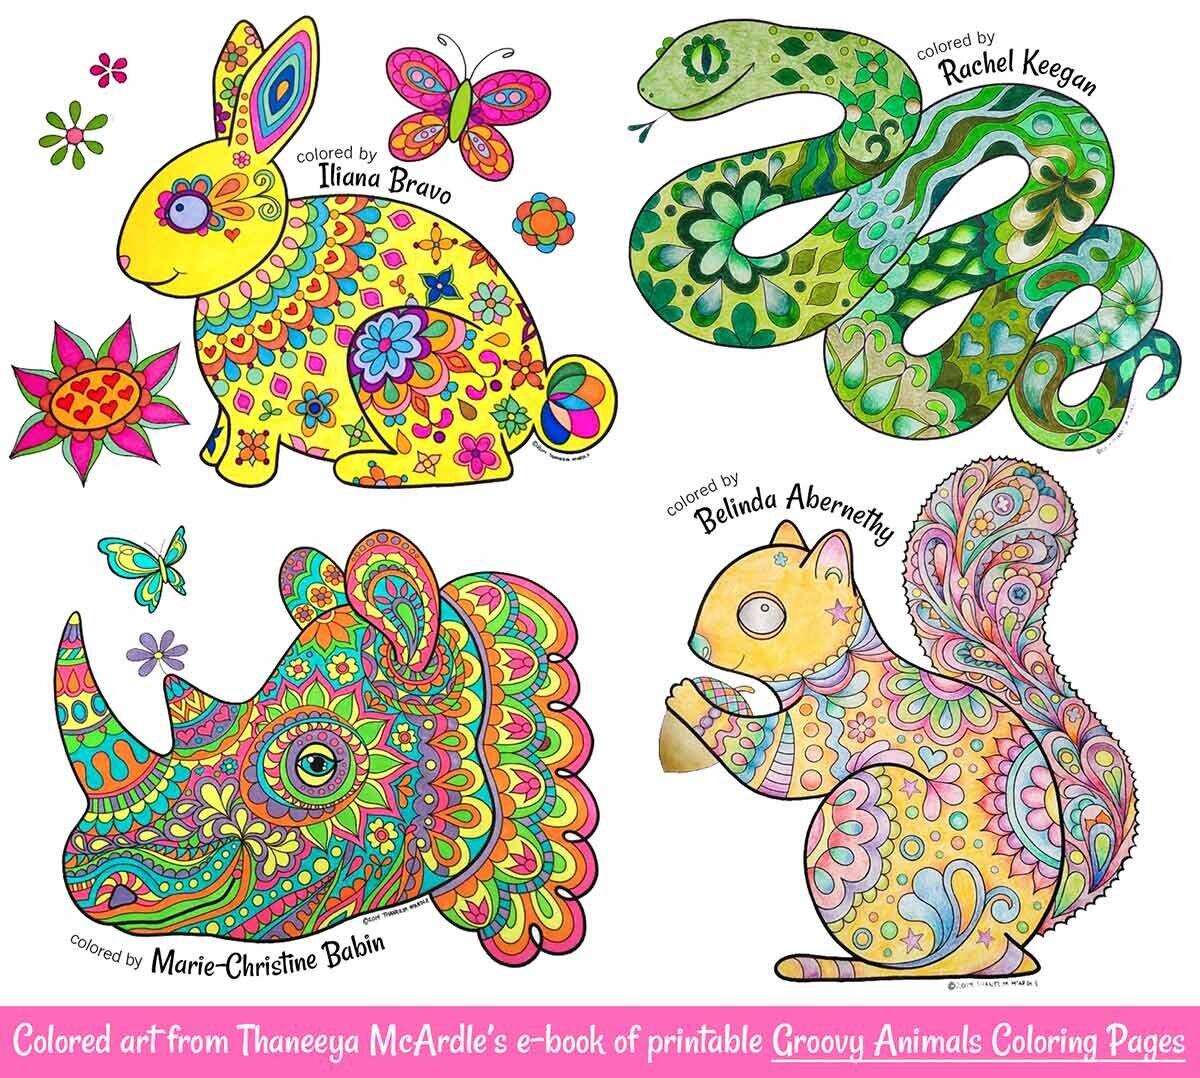 Groovy动物通过缅甸宏伟的betway必威官网app页面着色 -  20个异想天开的动物必威西蒙体育 欧盟体育插图,下载,打印和颜色!